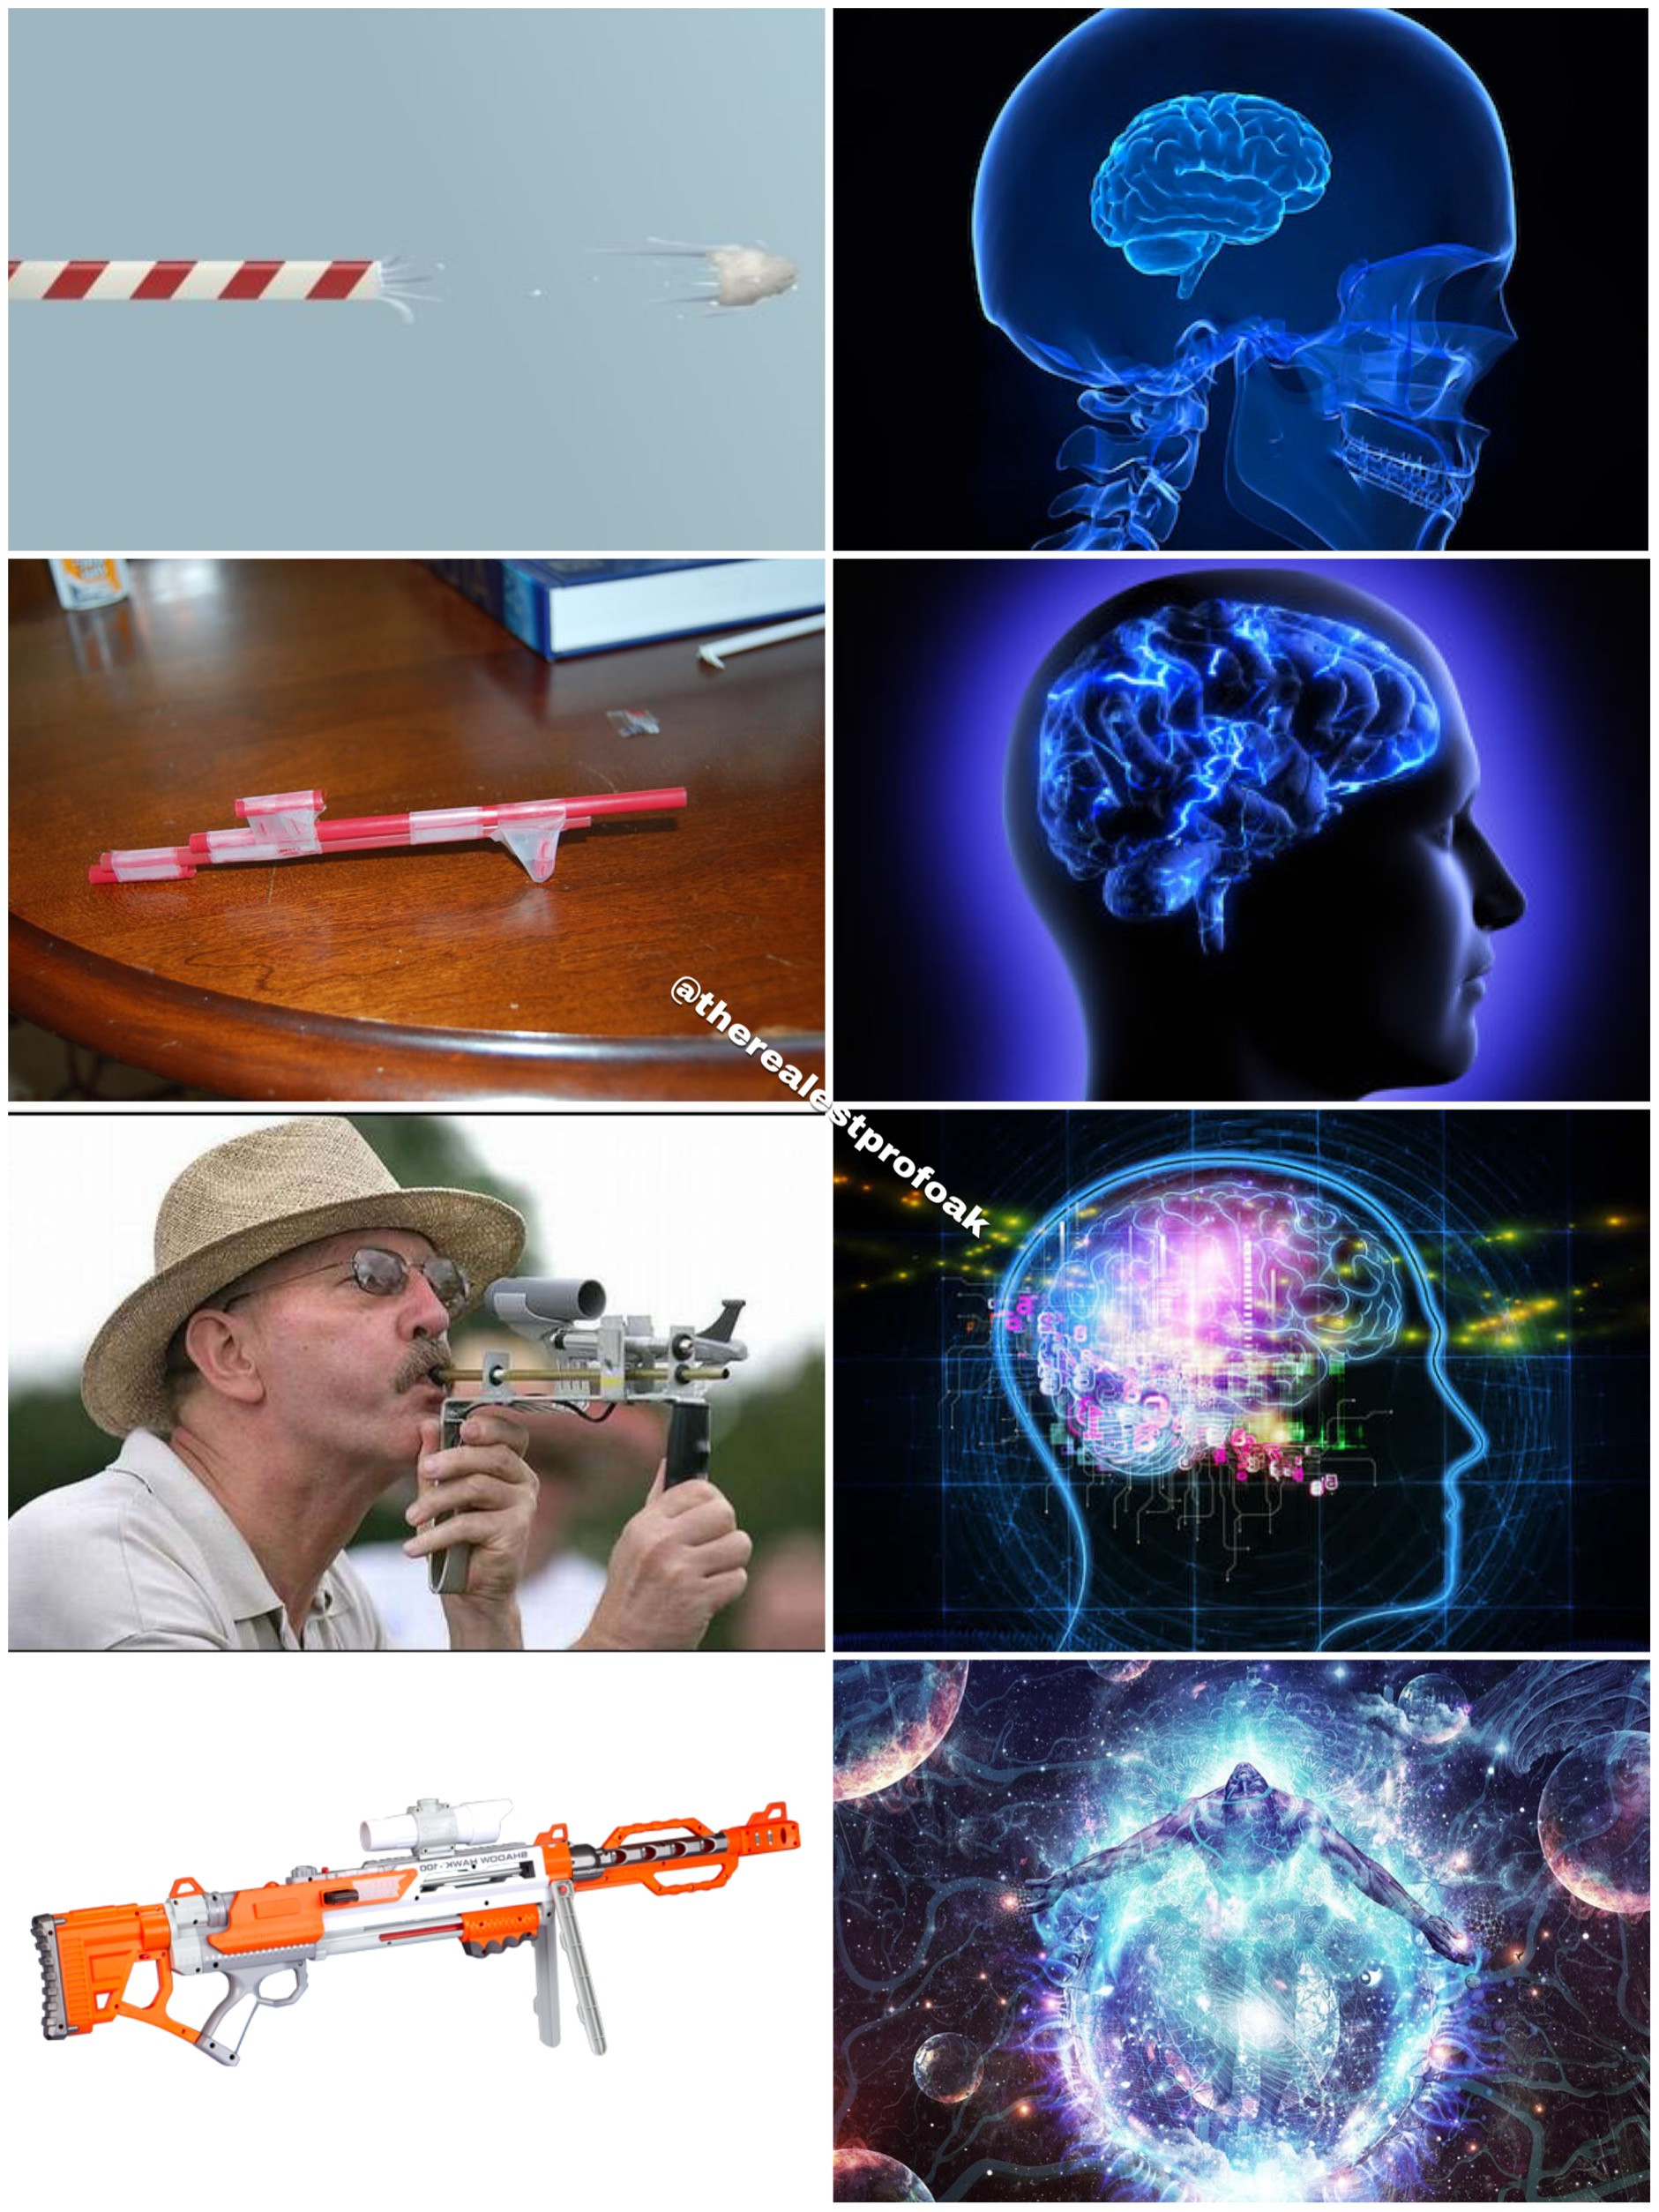 extended expanding brain meme template brain meme neurologist product jpg 1881x2508 expanding brain meme generator